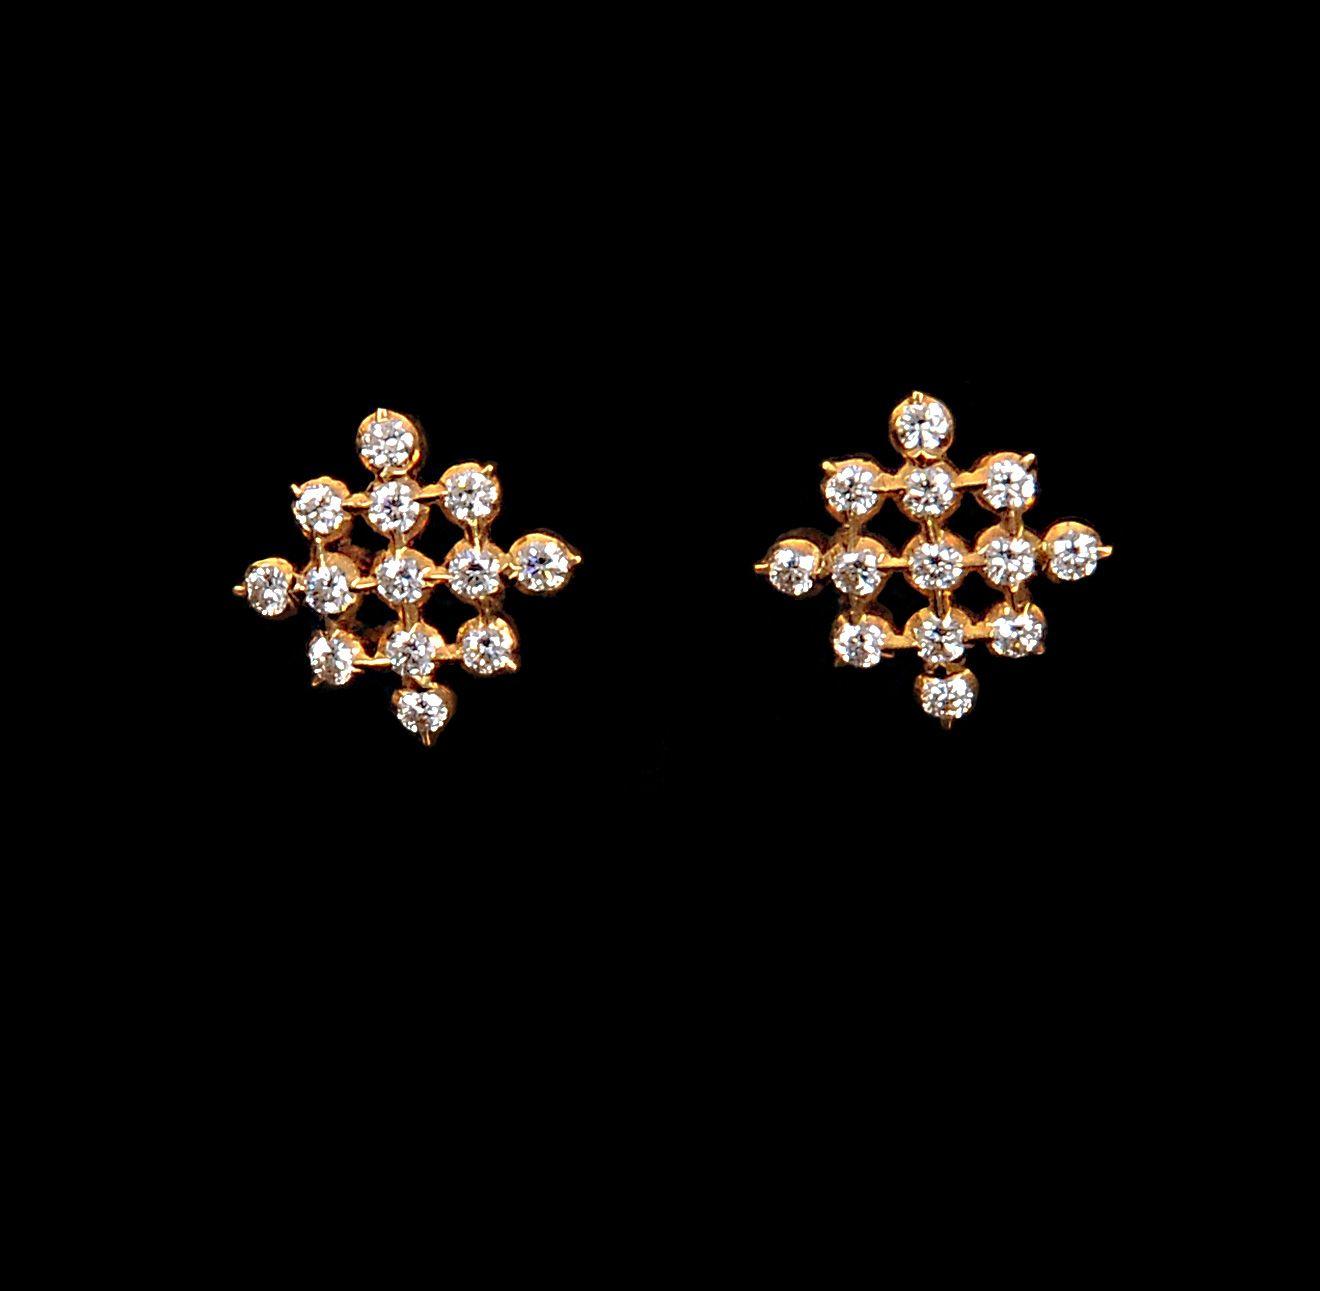 Close Set Diamond Necklace Earings Studs Pendant Gold Earrings